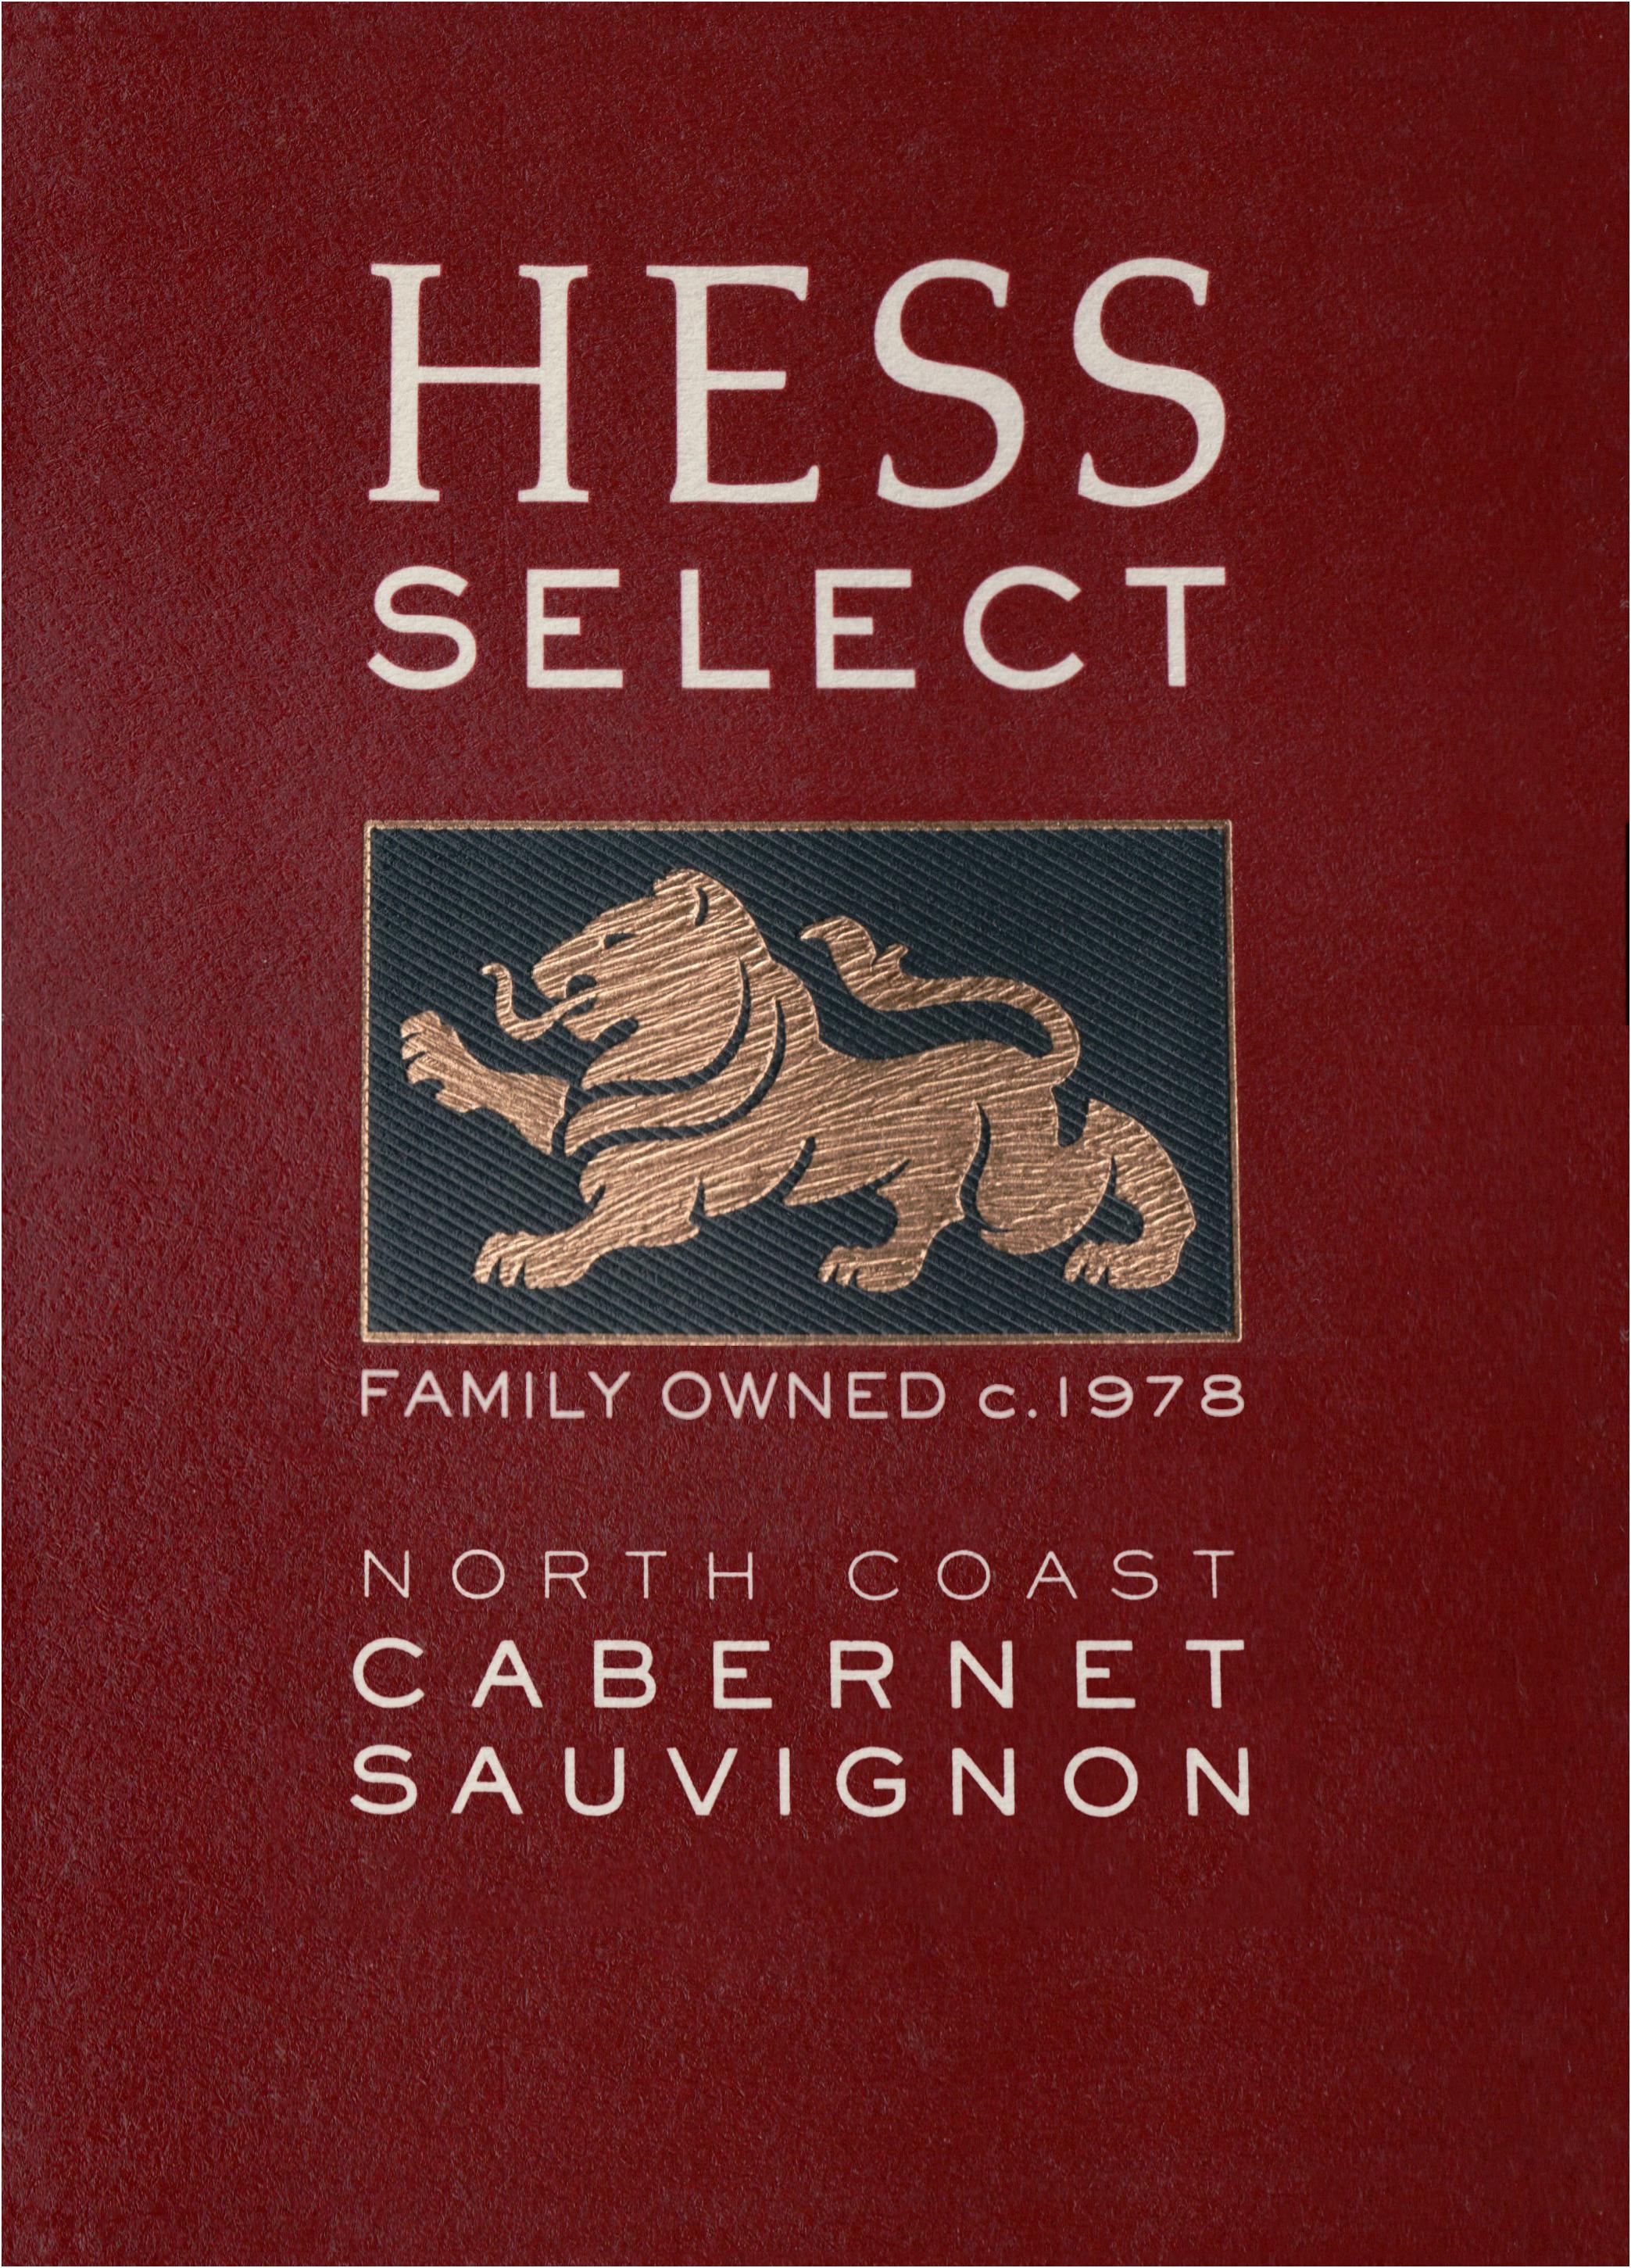 Hess Select Cabernet Sauvignon 2017